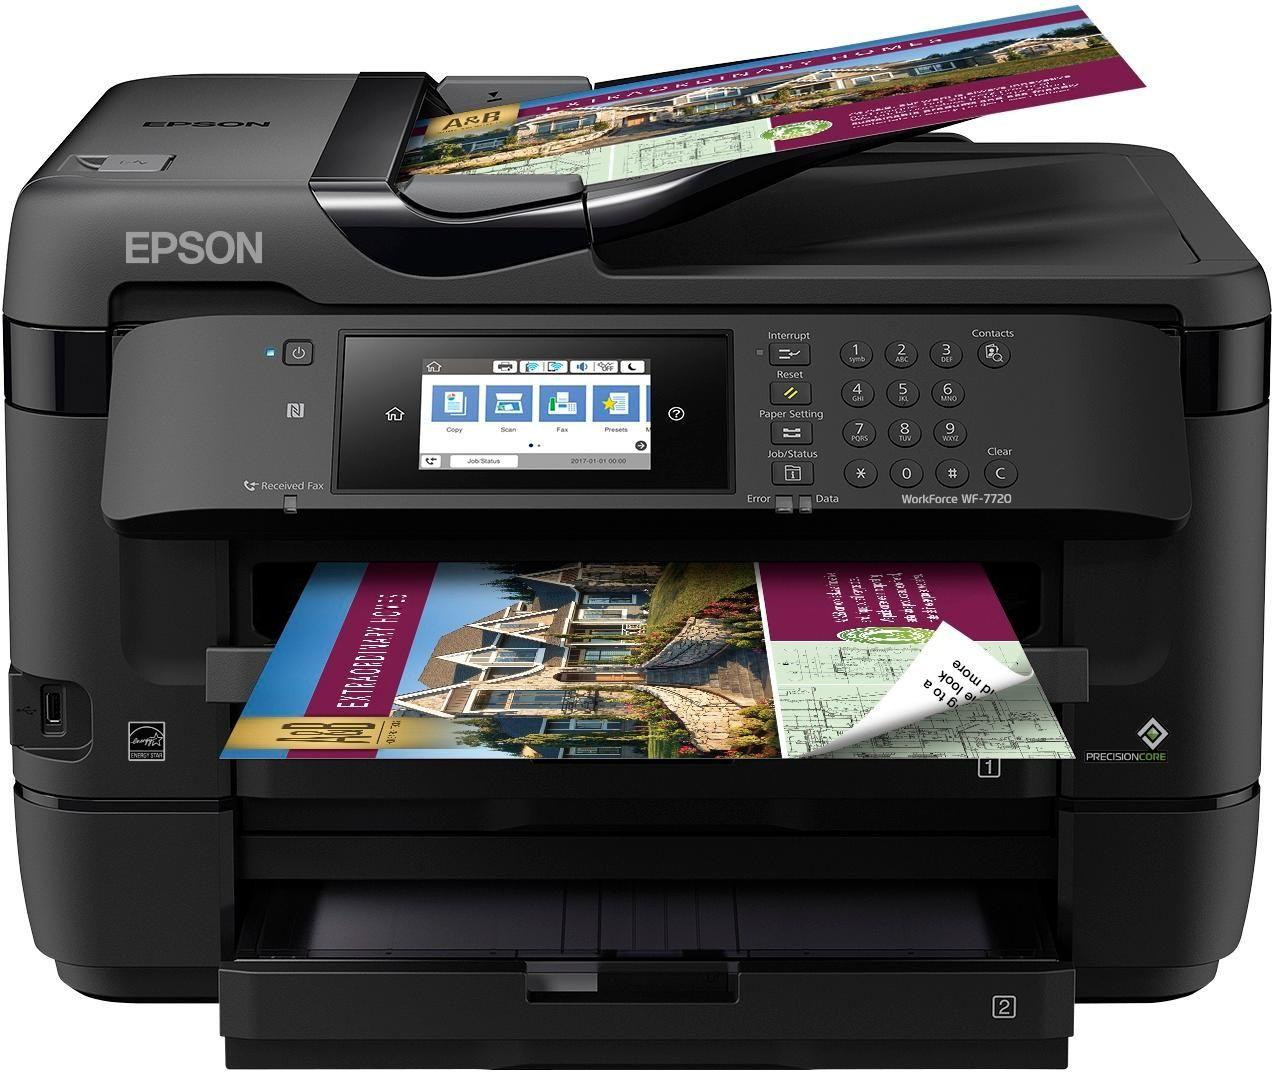 Epson Workforce Wf 7720 Wireless All In One Inkjet Printer Black